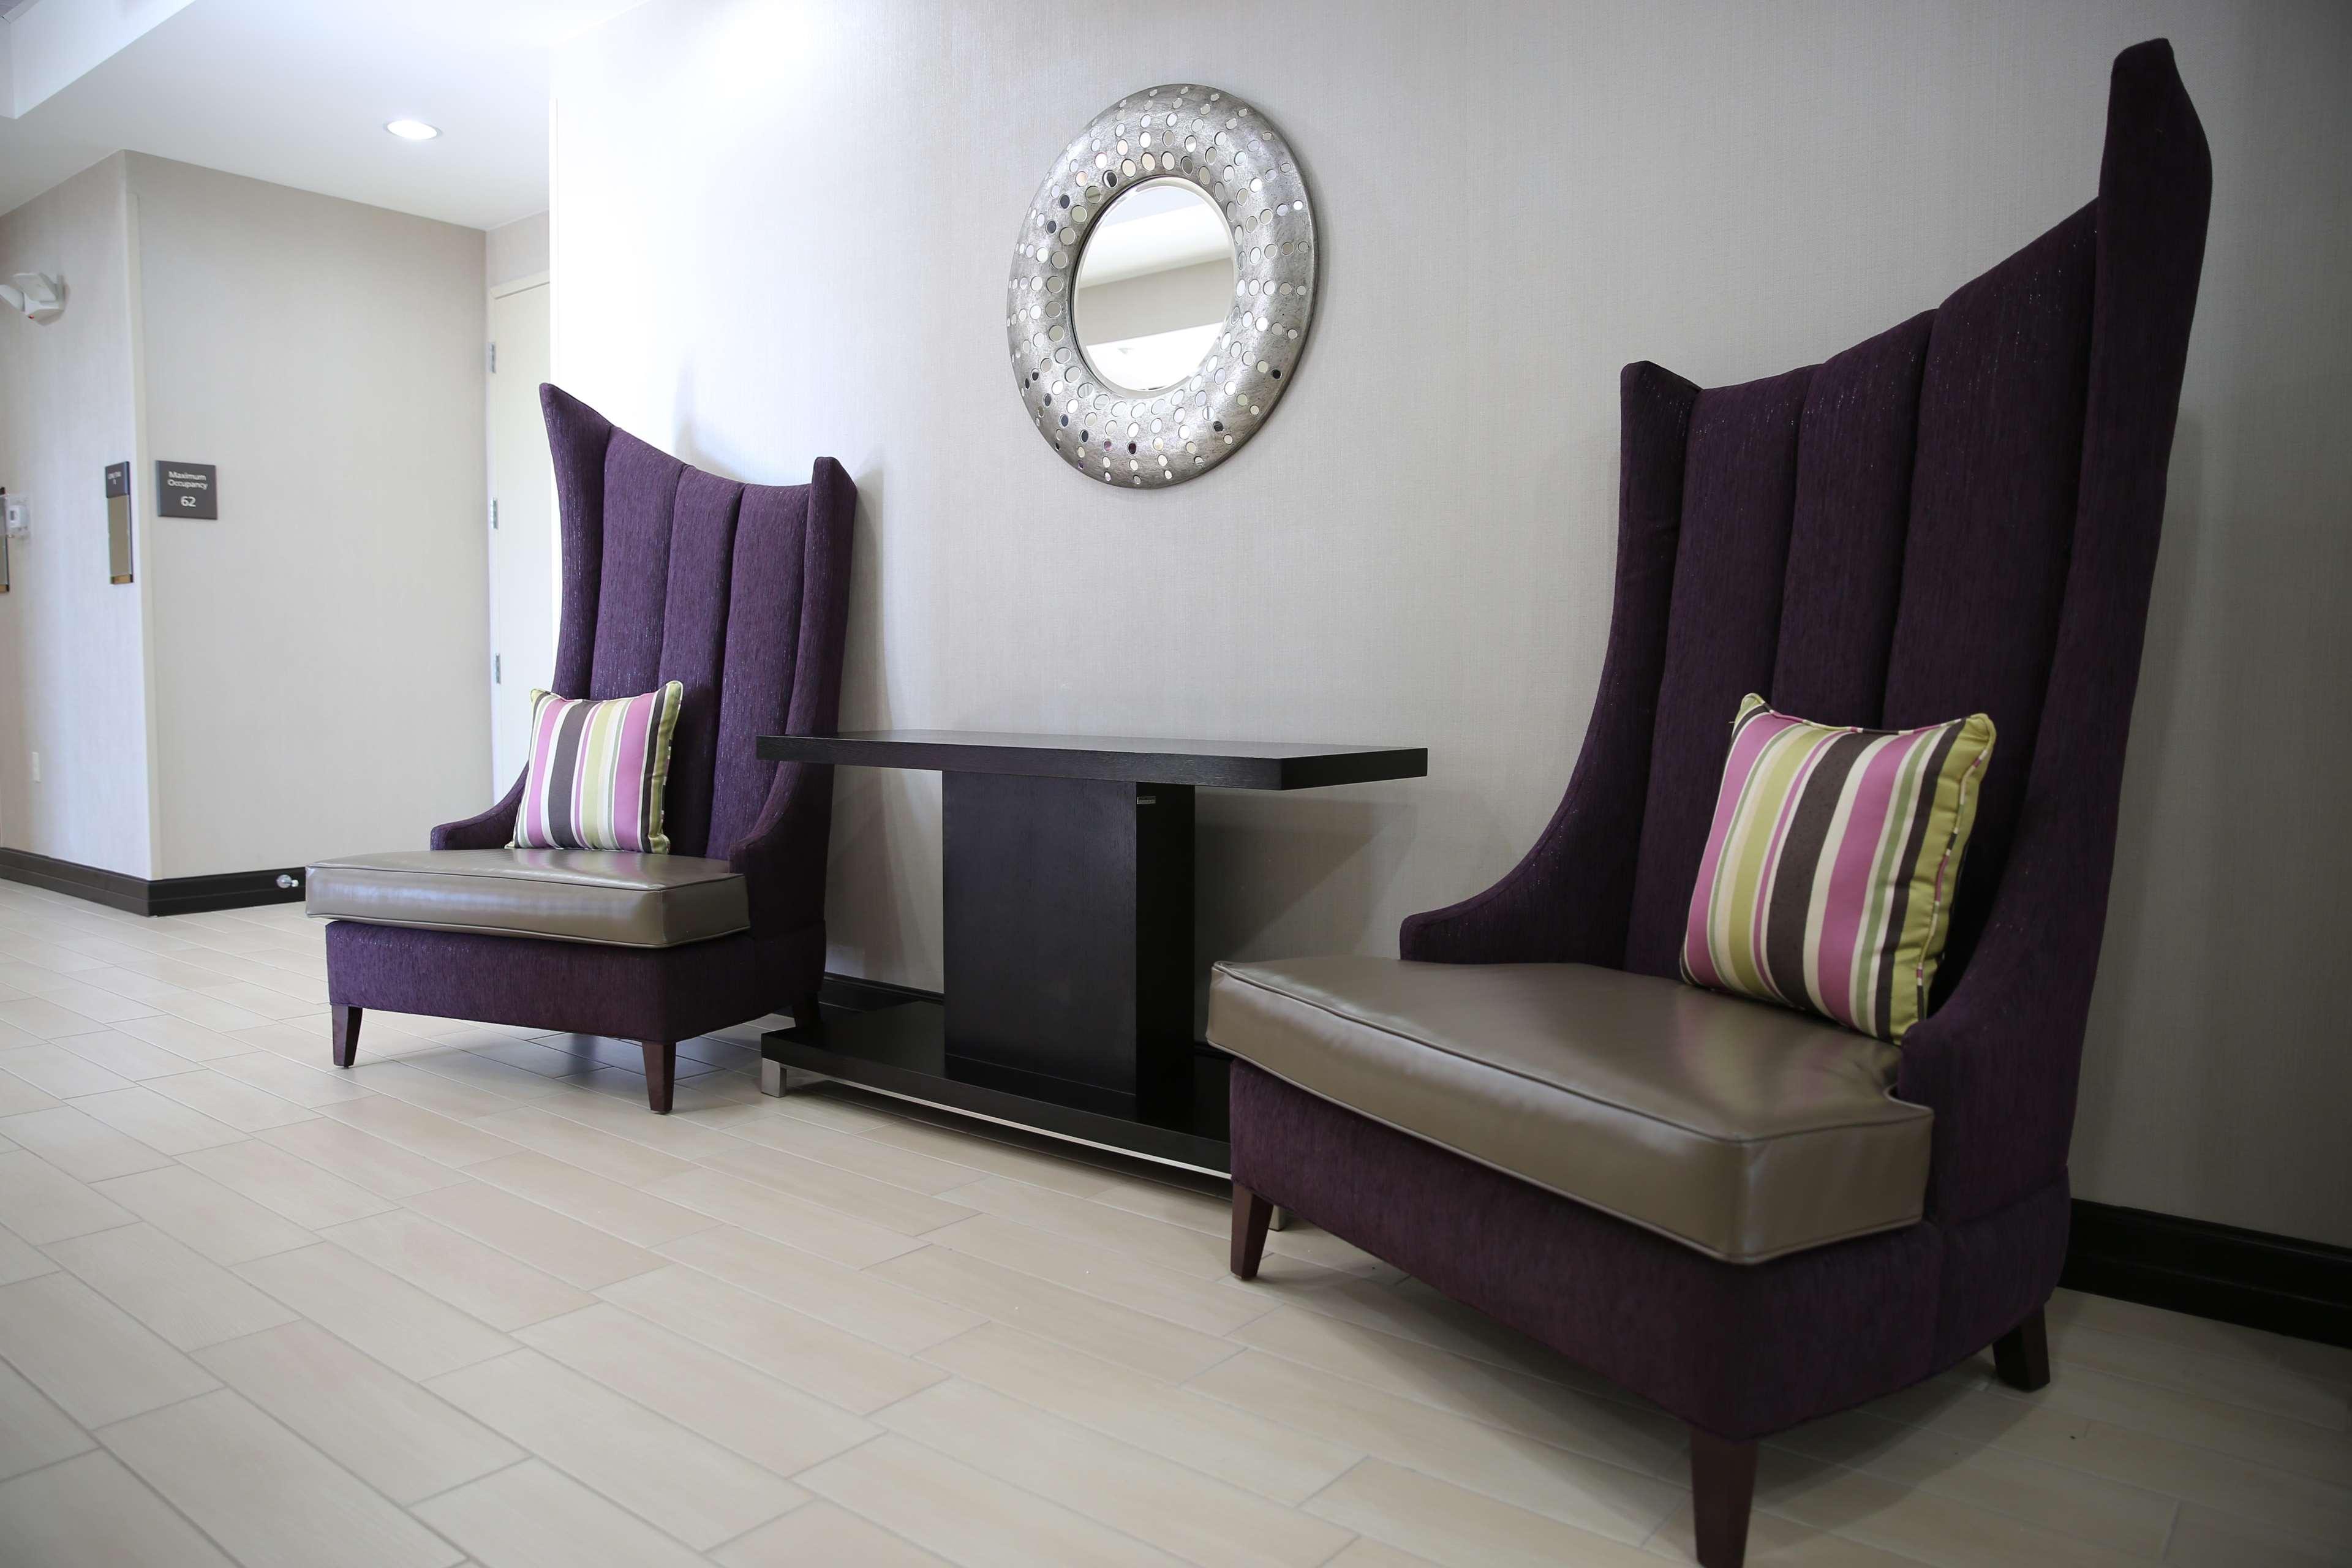 Hampton Inn & Suites Missouri City, TX image 13